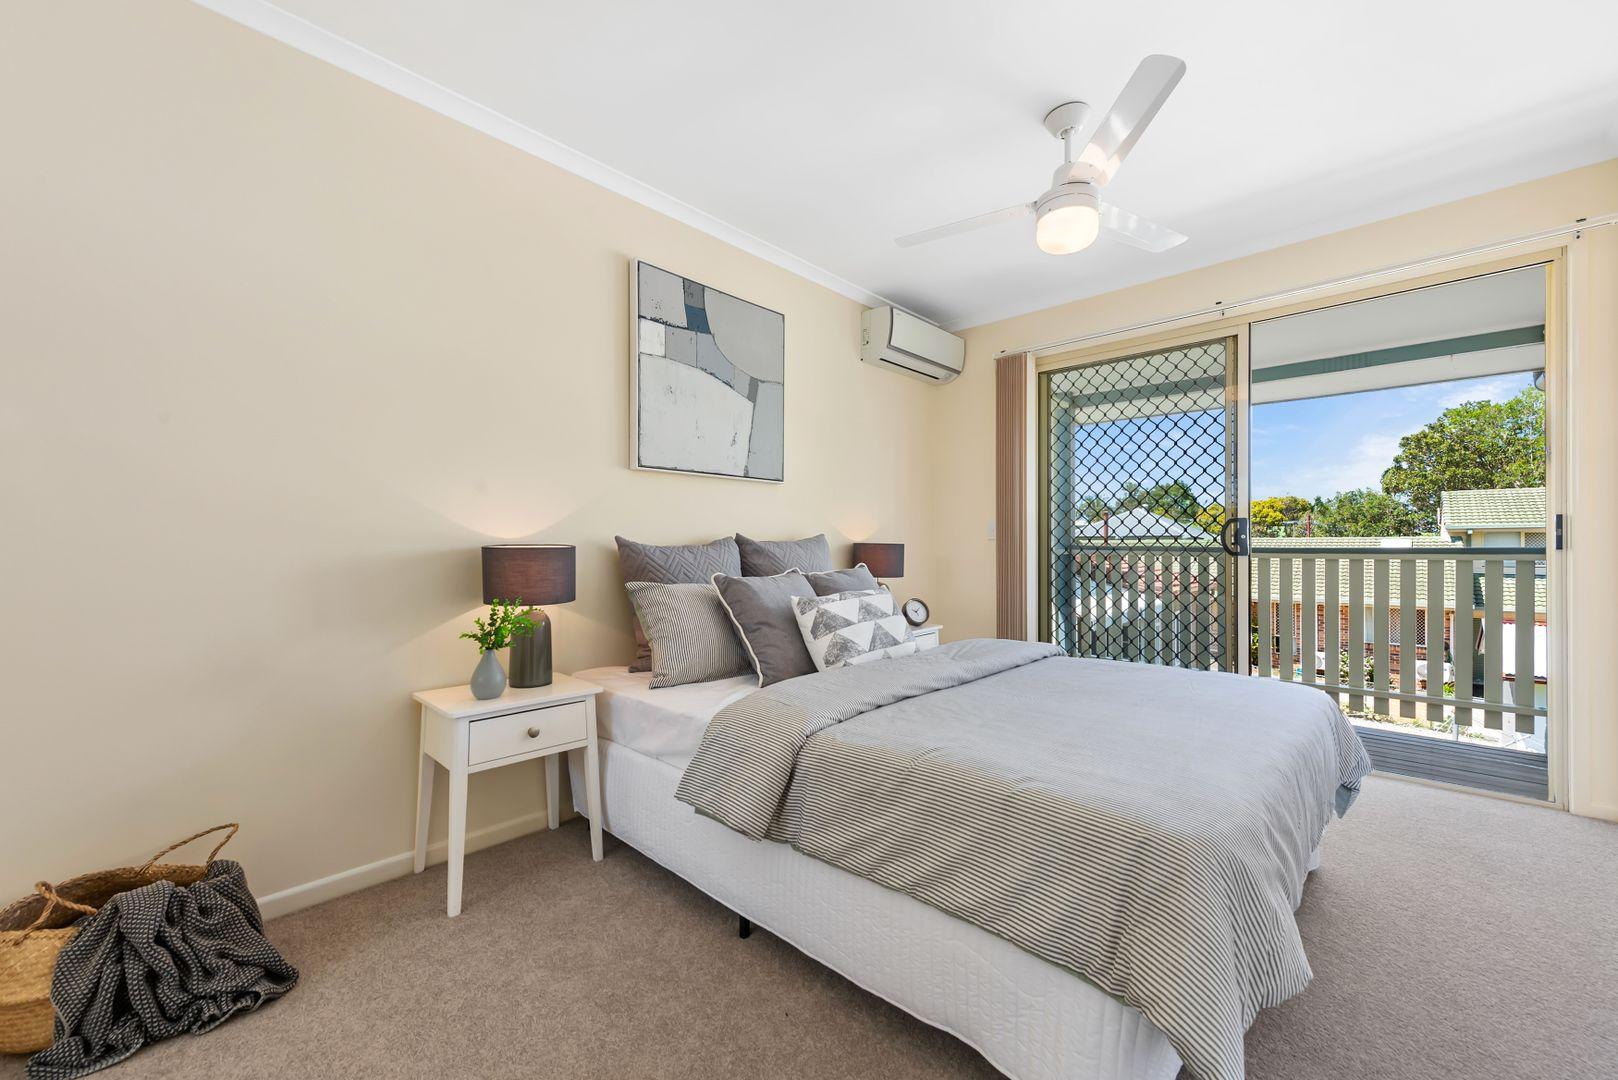 3/36 Gaythorne Road, Gaythorne QLD 4051, Image 0